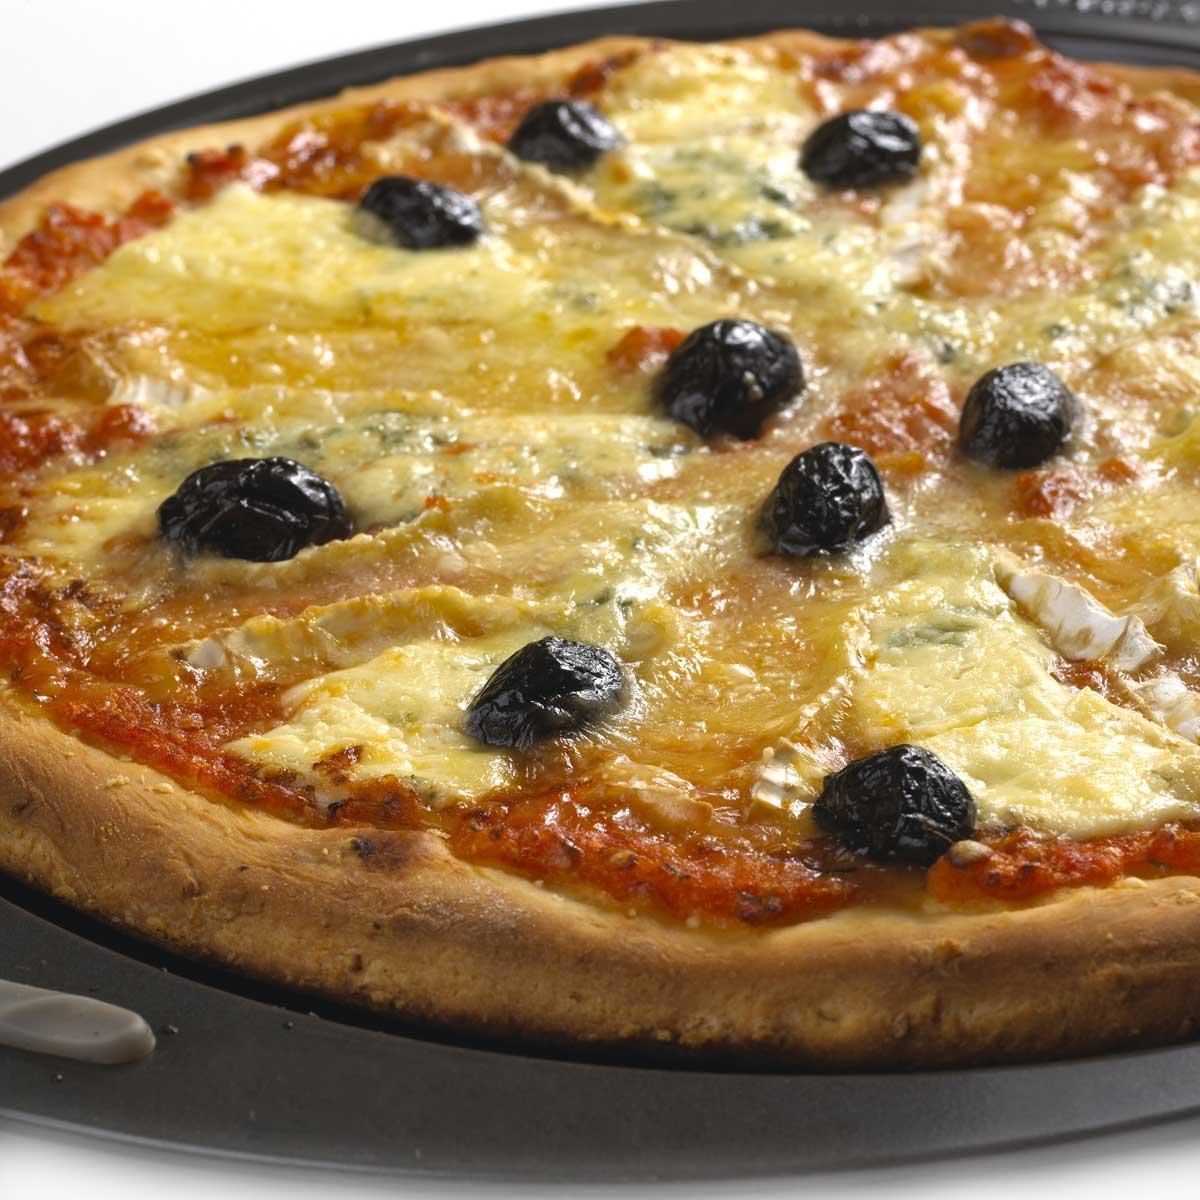 recette pizza aux trois fromages cuisine madame figaro. Black Bedroom Furniture Sets. Home Design Ideas